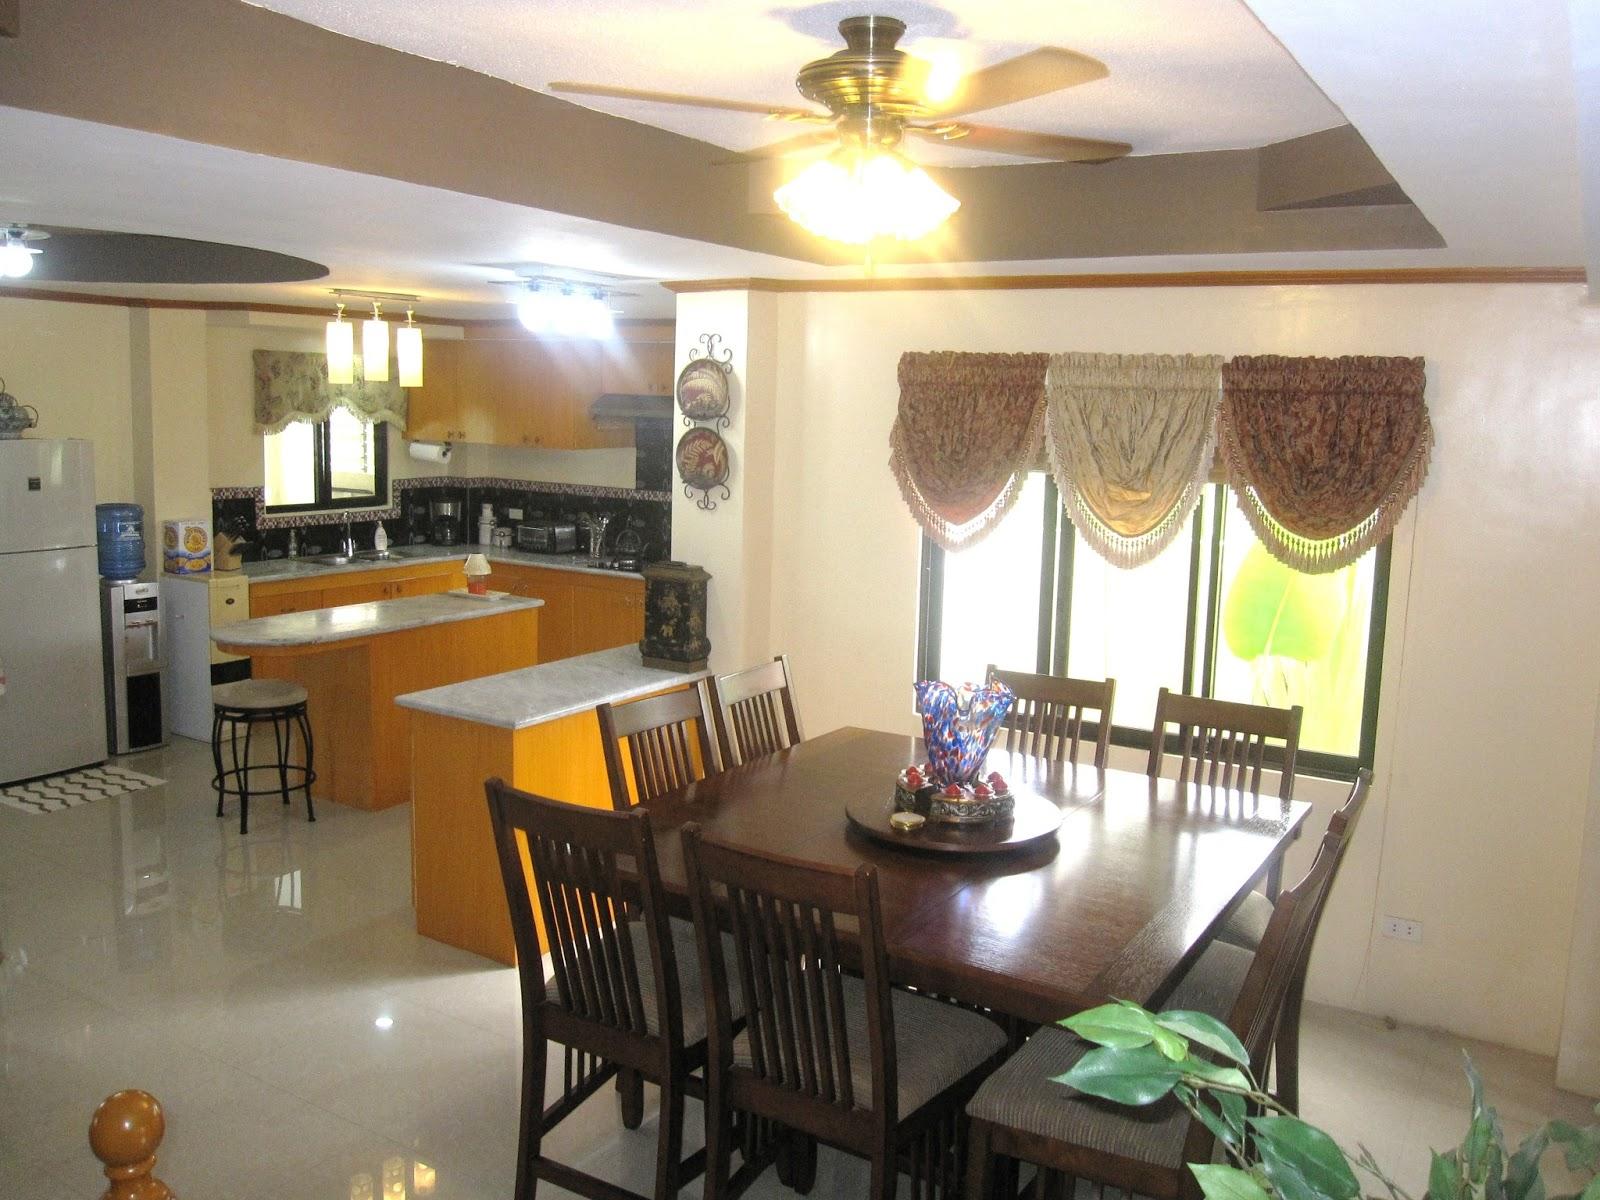 Kitchen Countertops For Sale Cebu